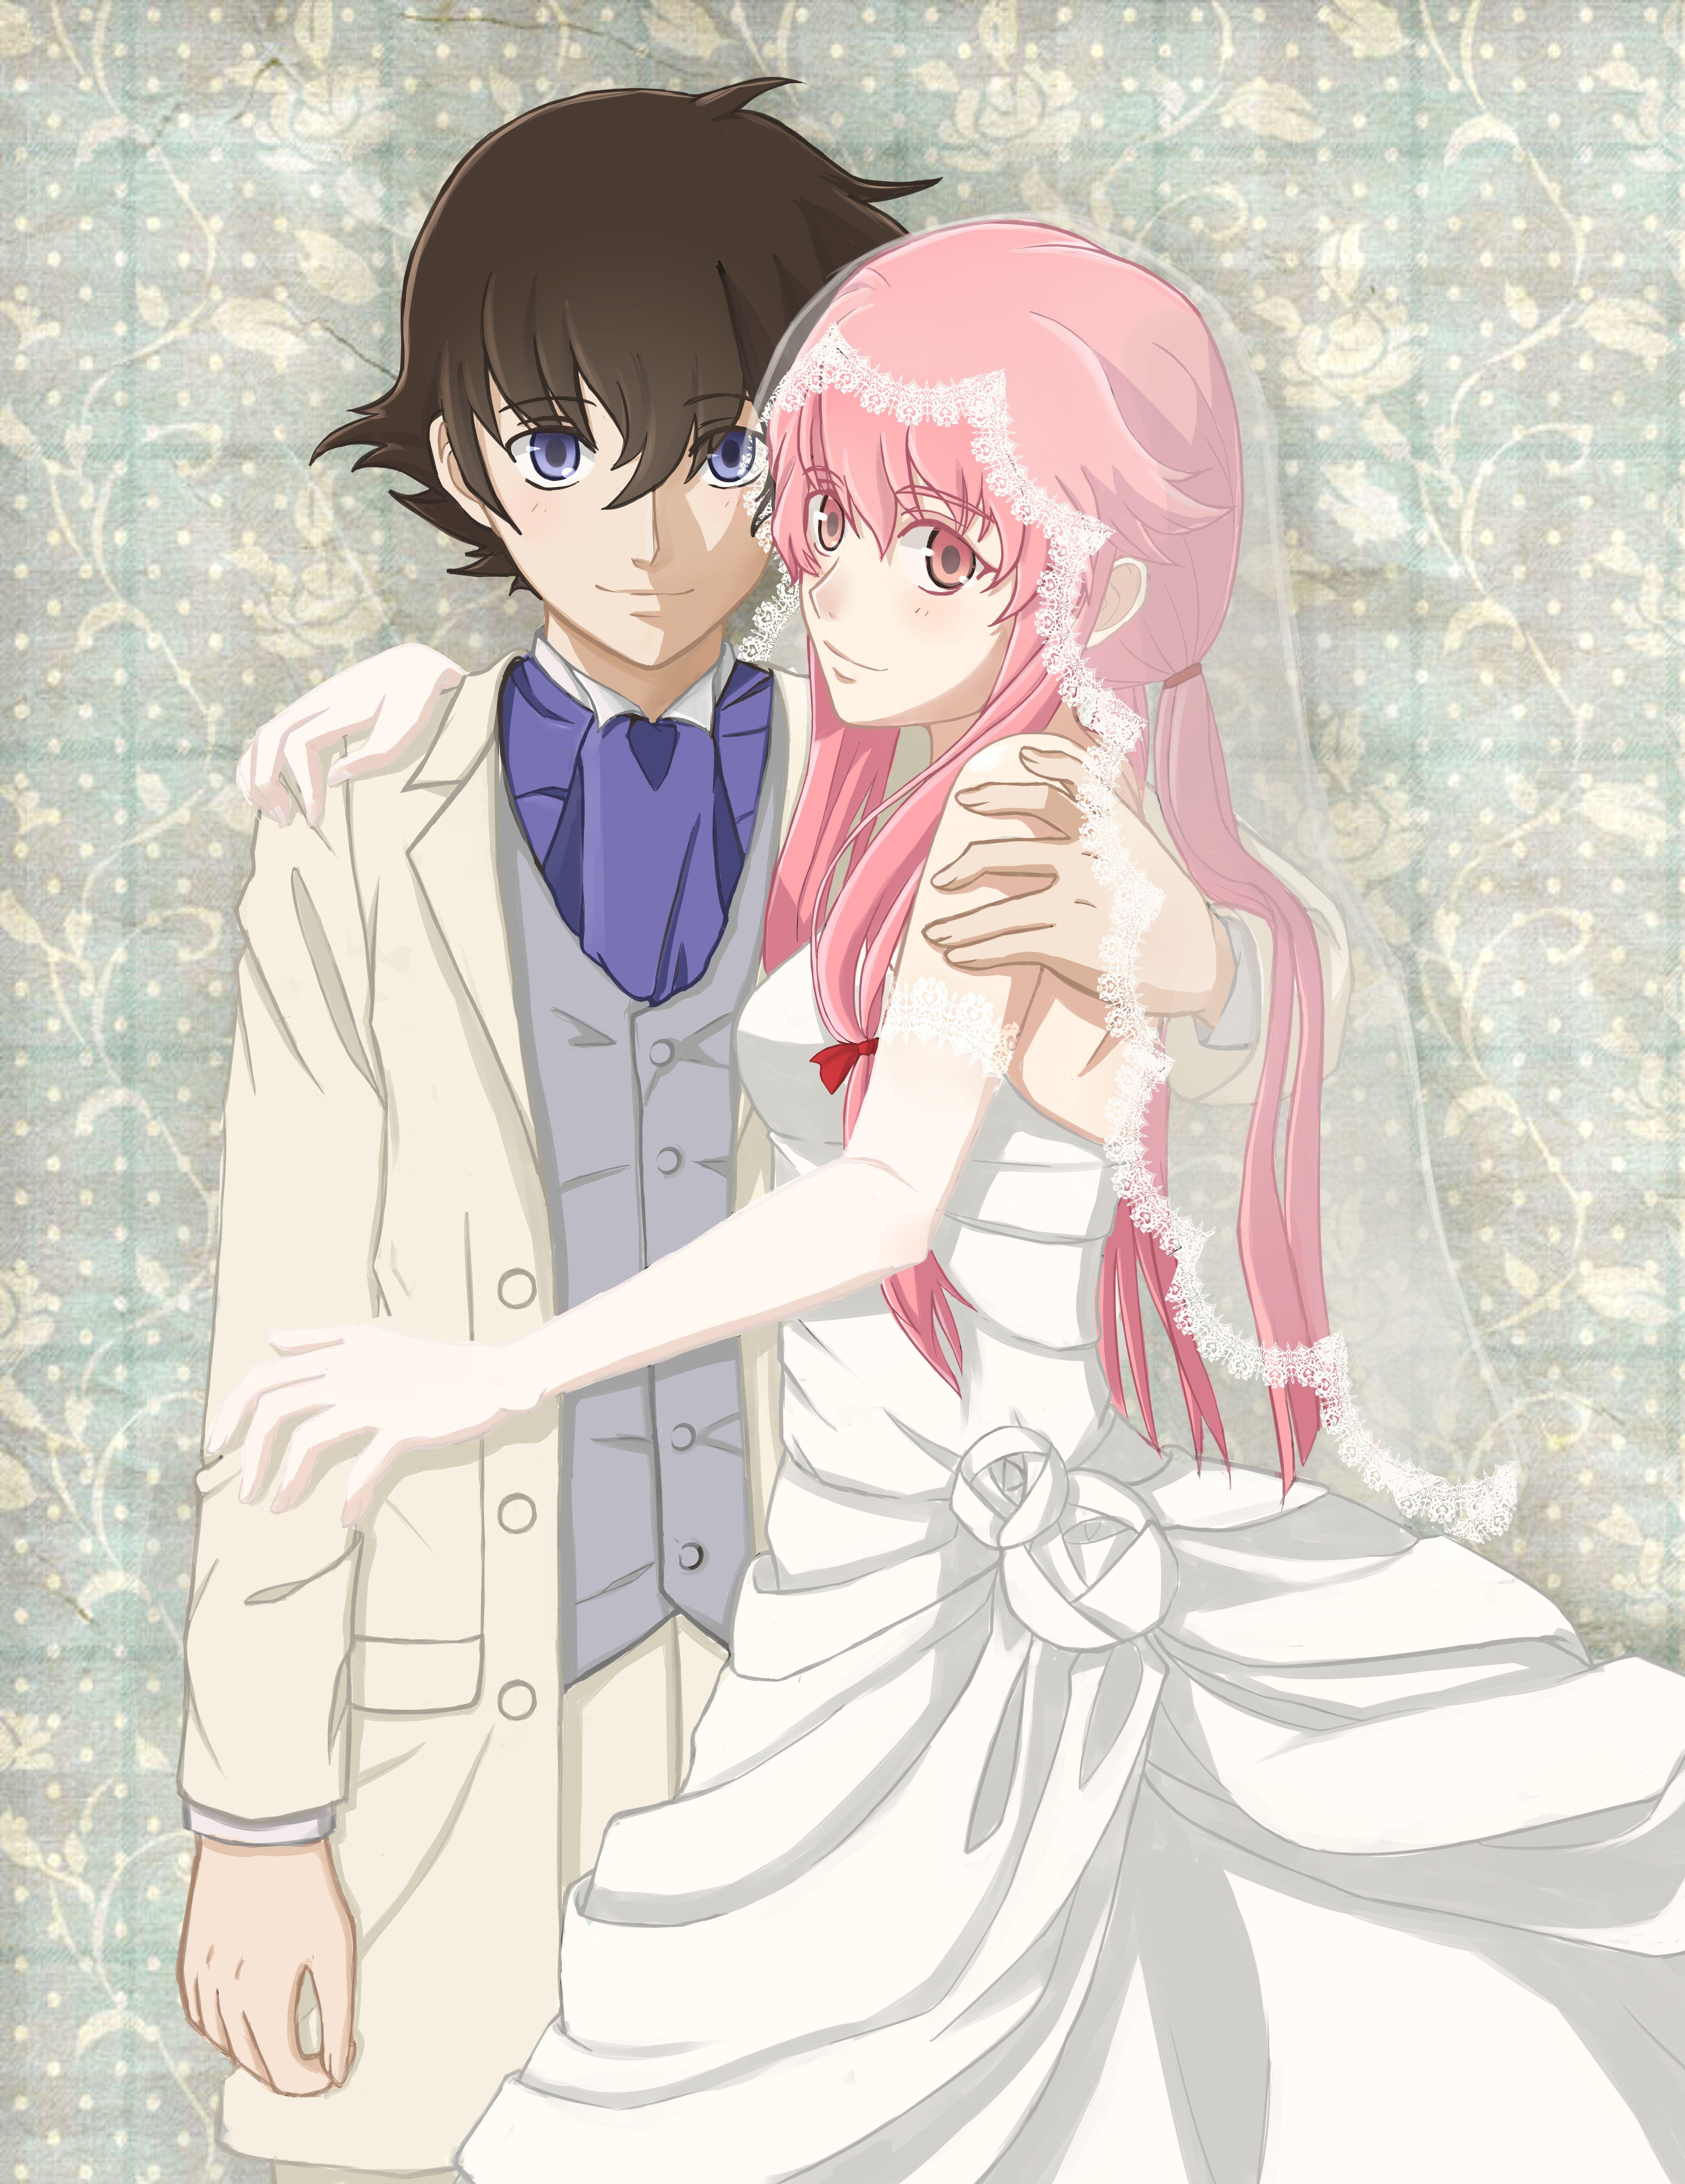 Yuno Gasai | Mirai nikki, Future diary and Anime